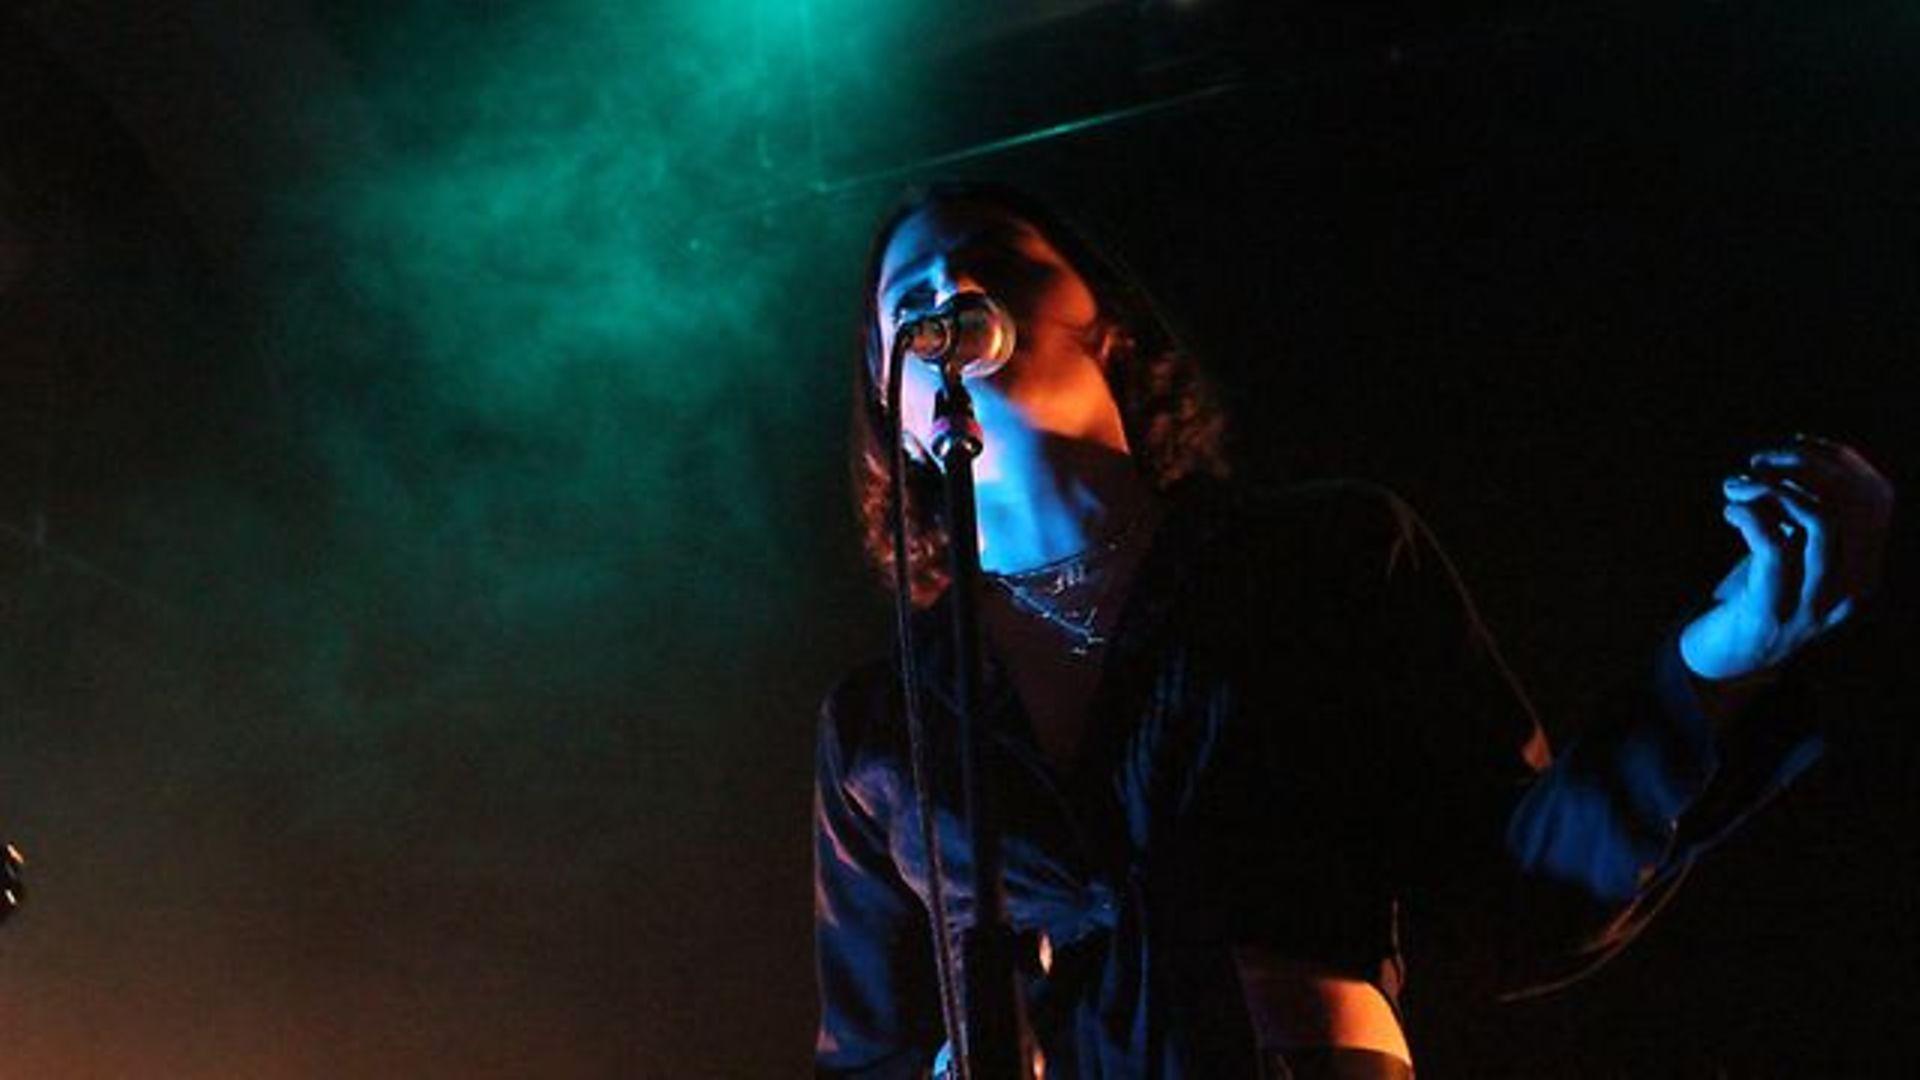 Indie artist Mattiel performing live. - Credit: Casey Cooper-Fiske